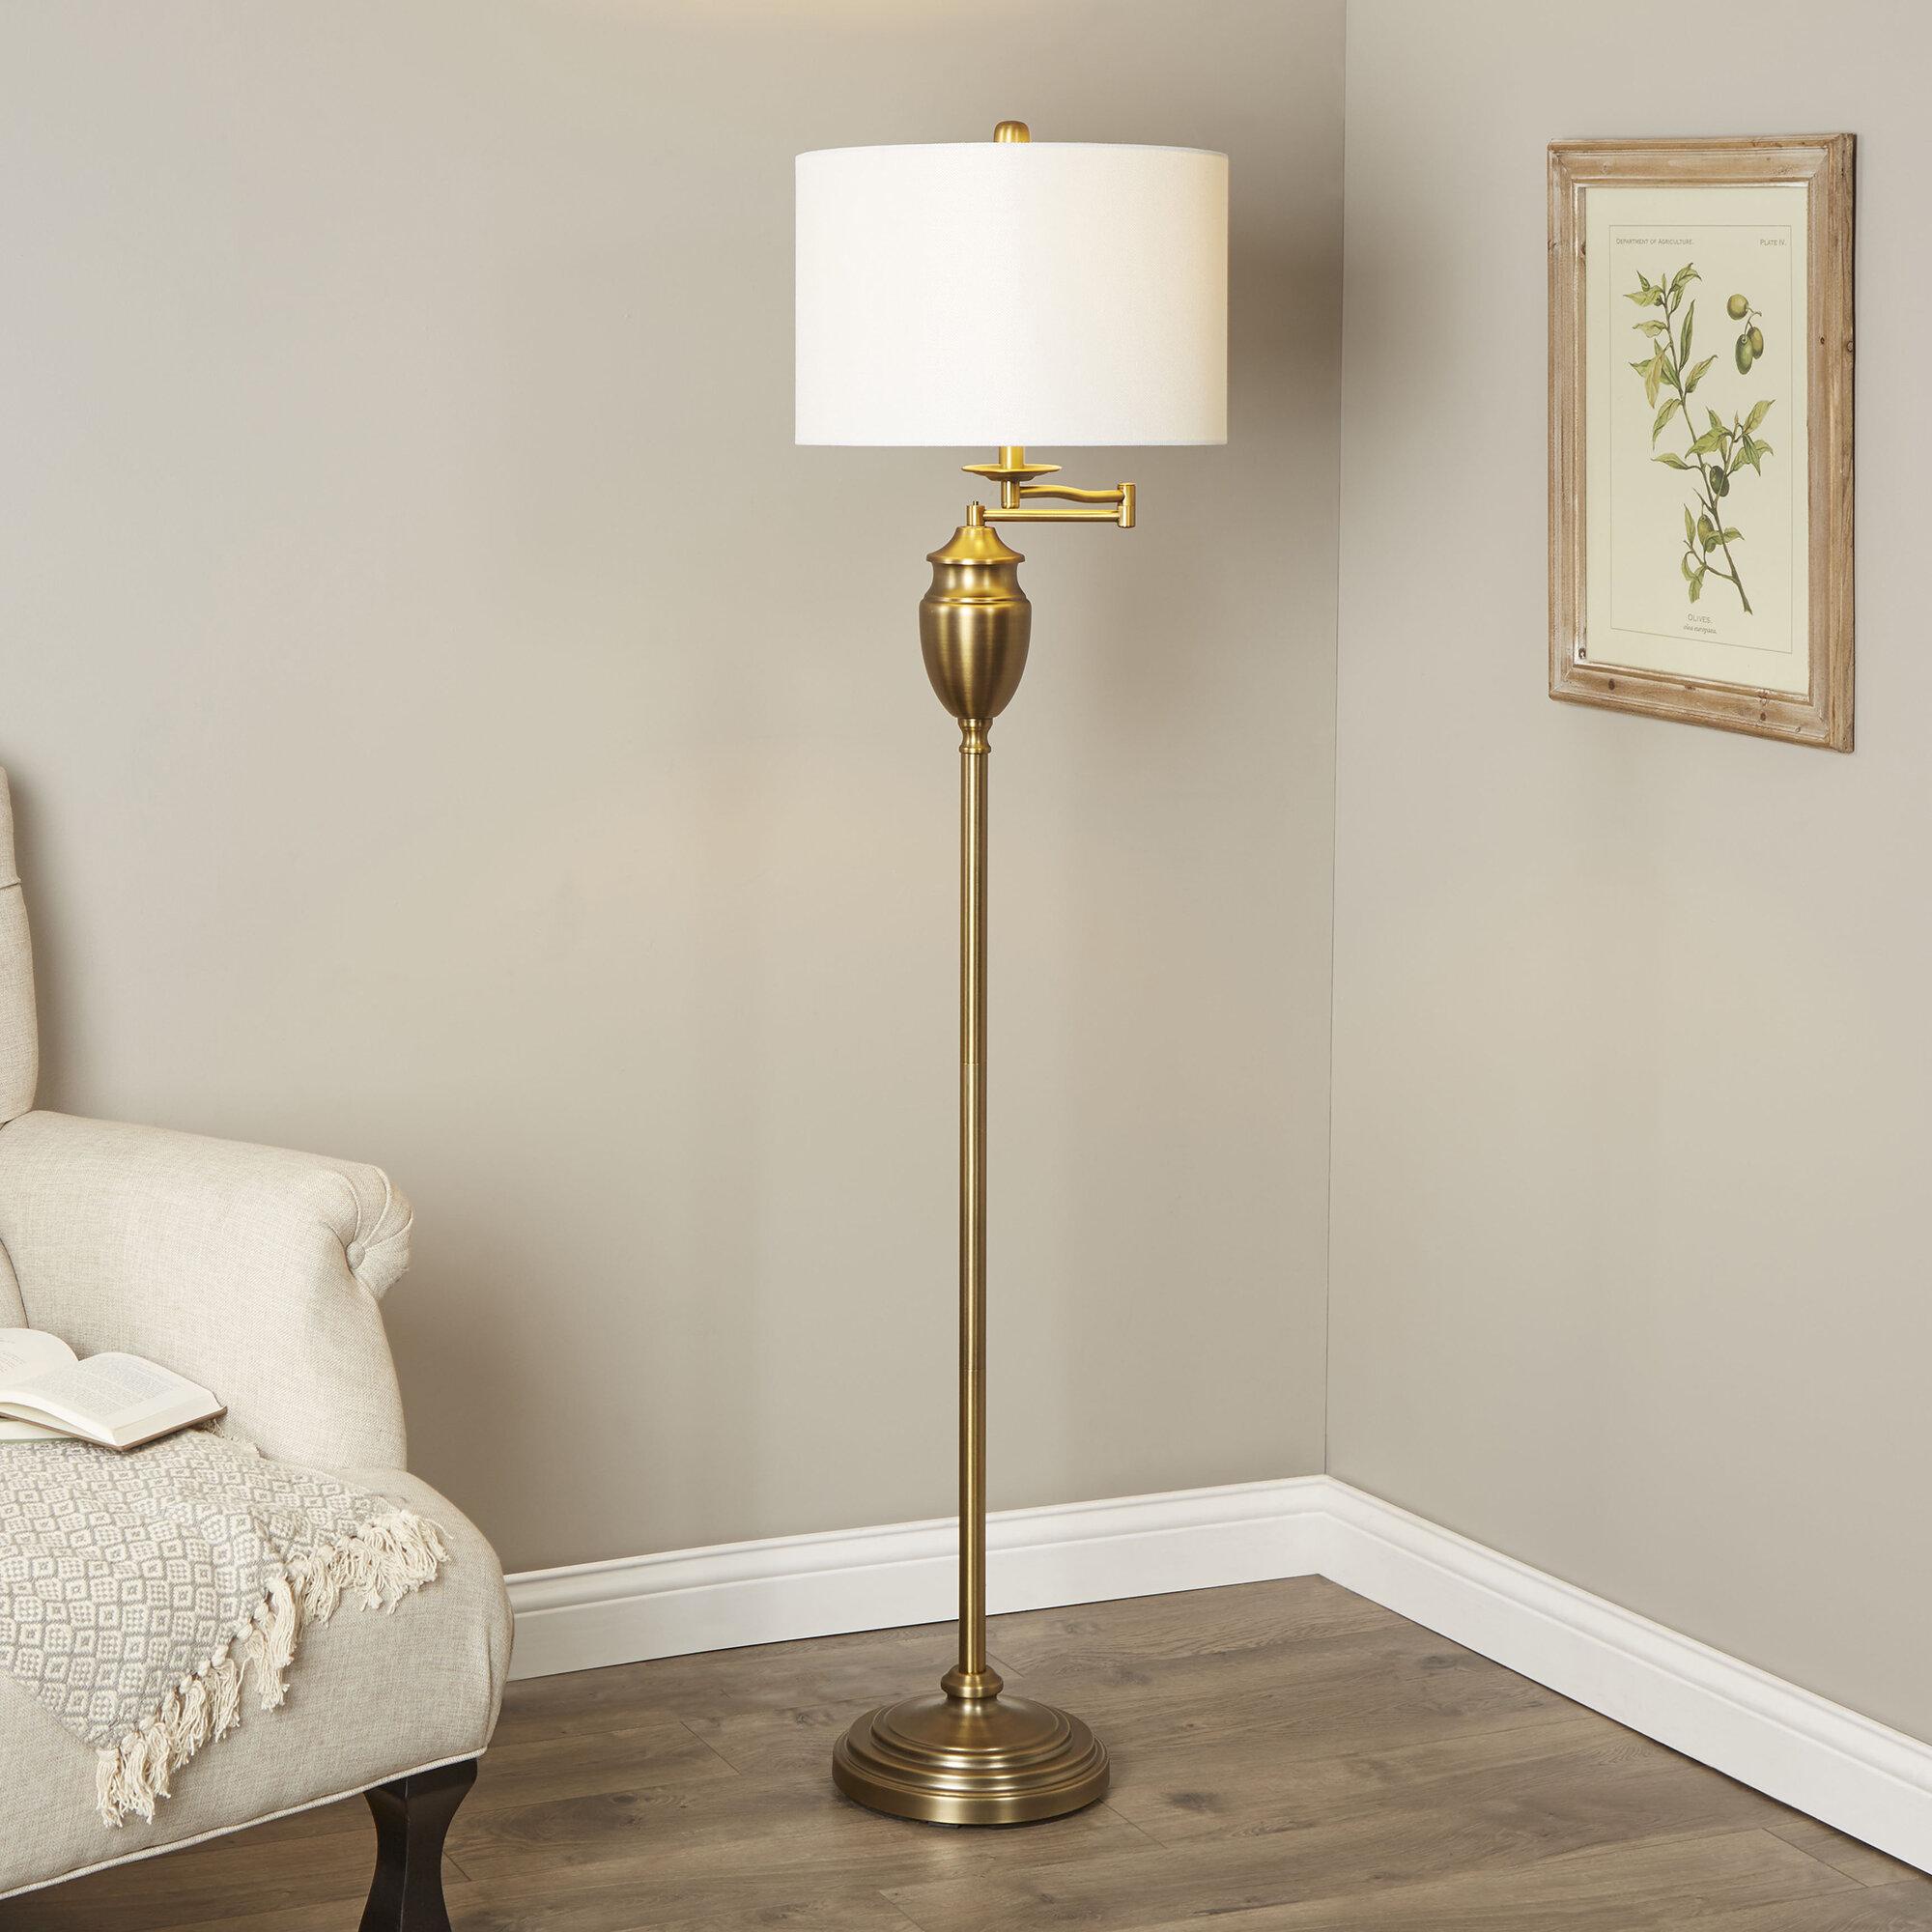 Galindo 60 Swing Arm Floor Lamp